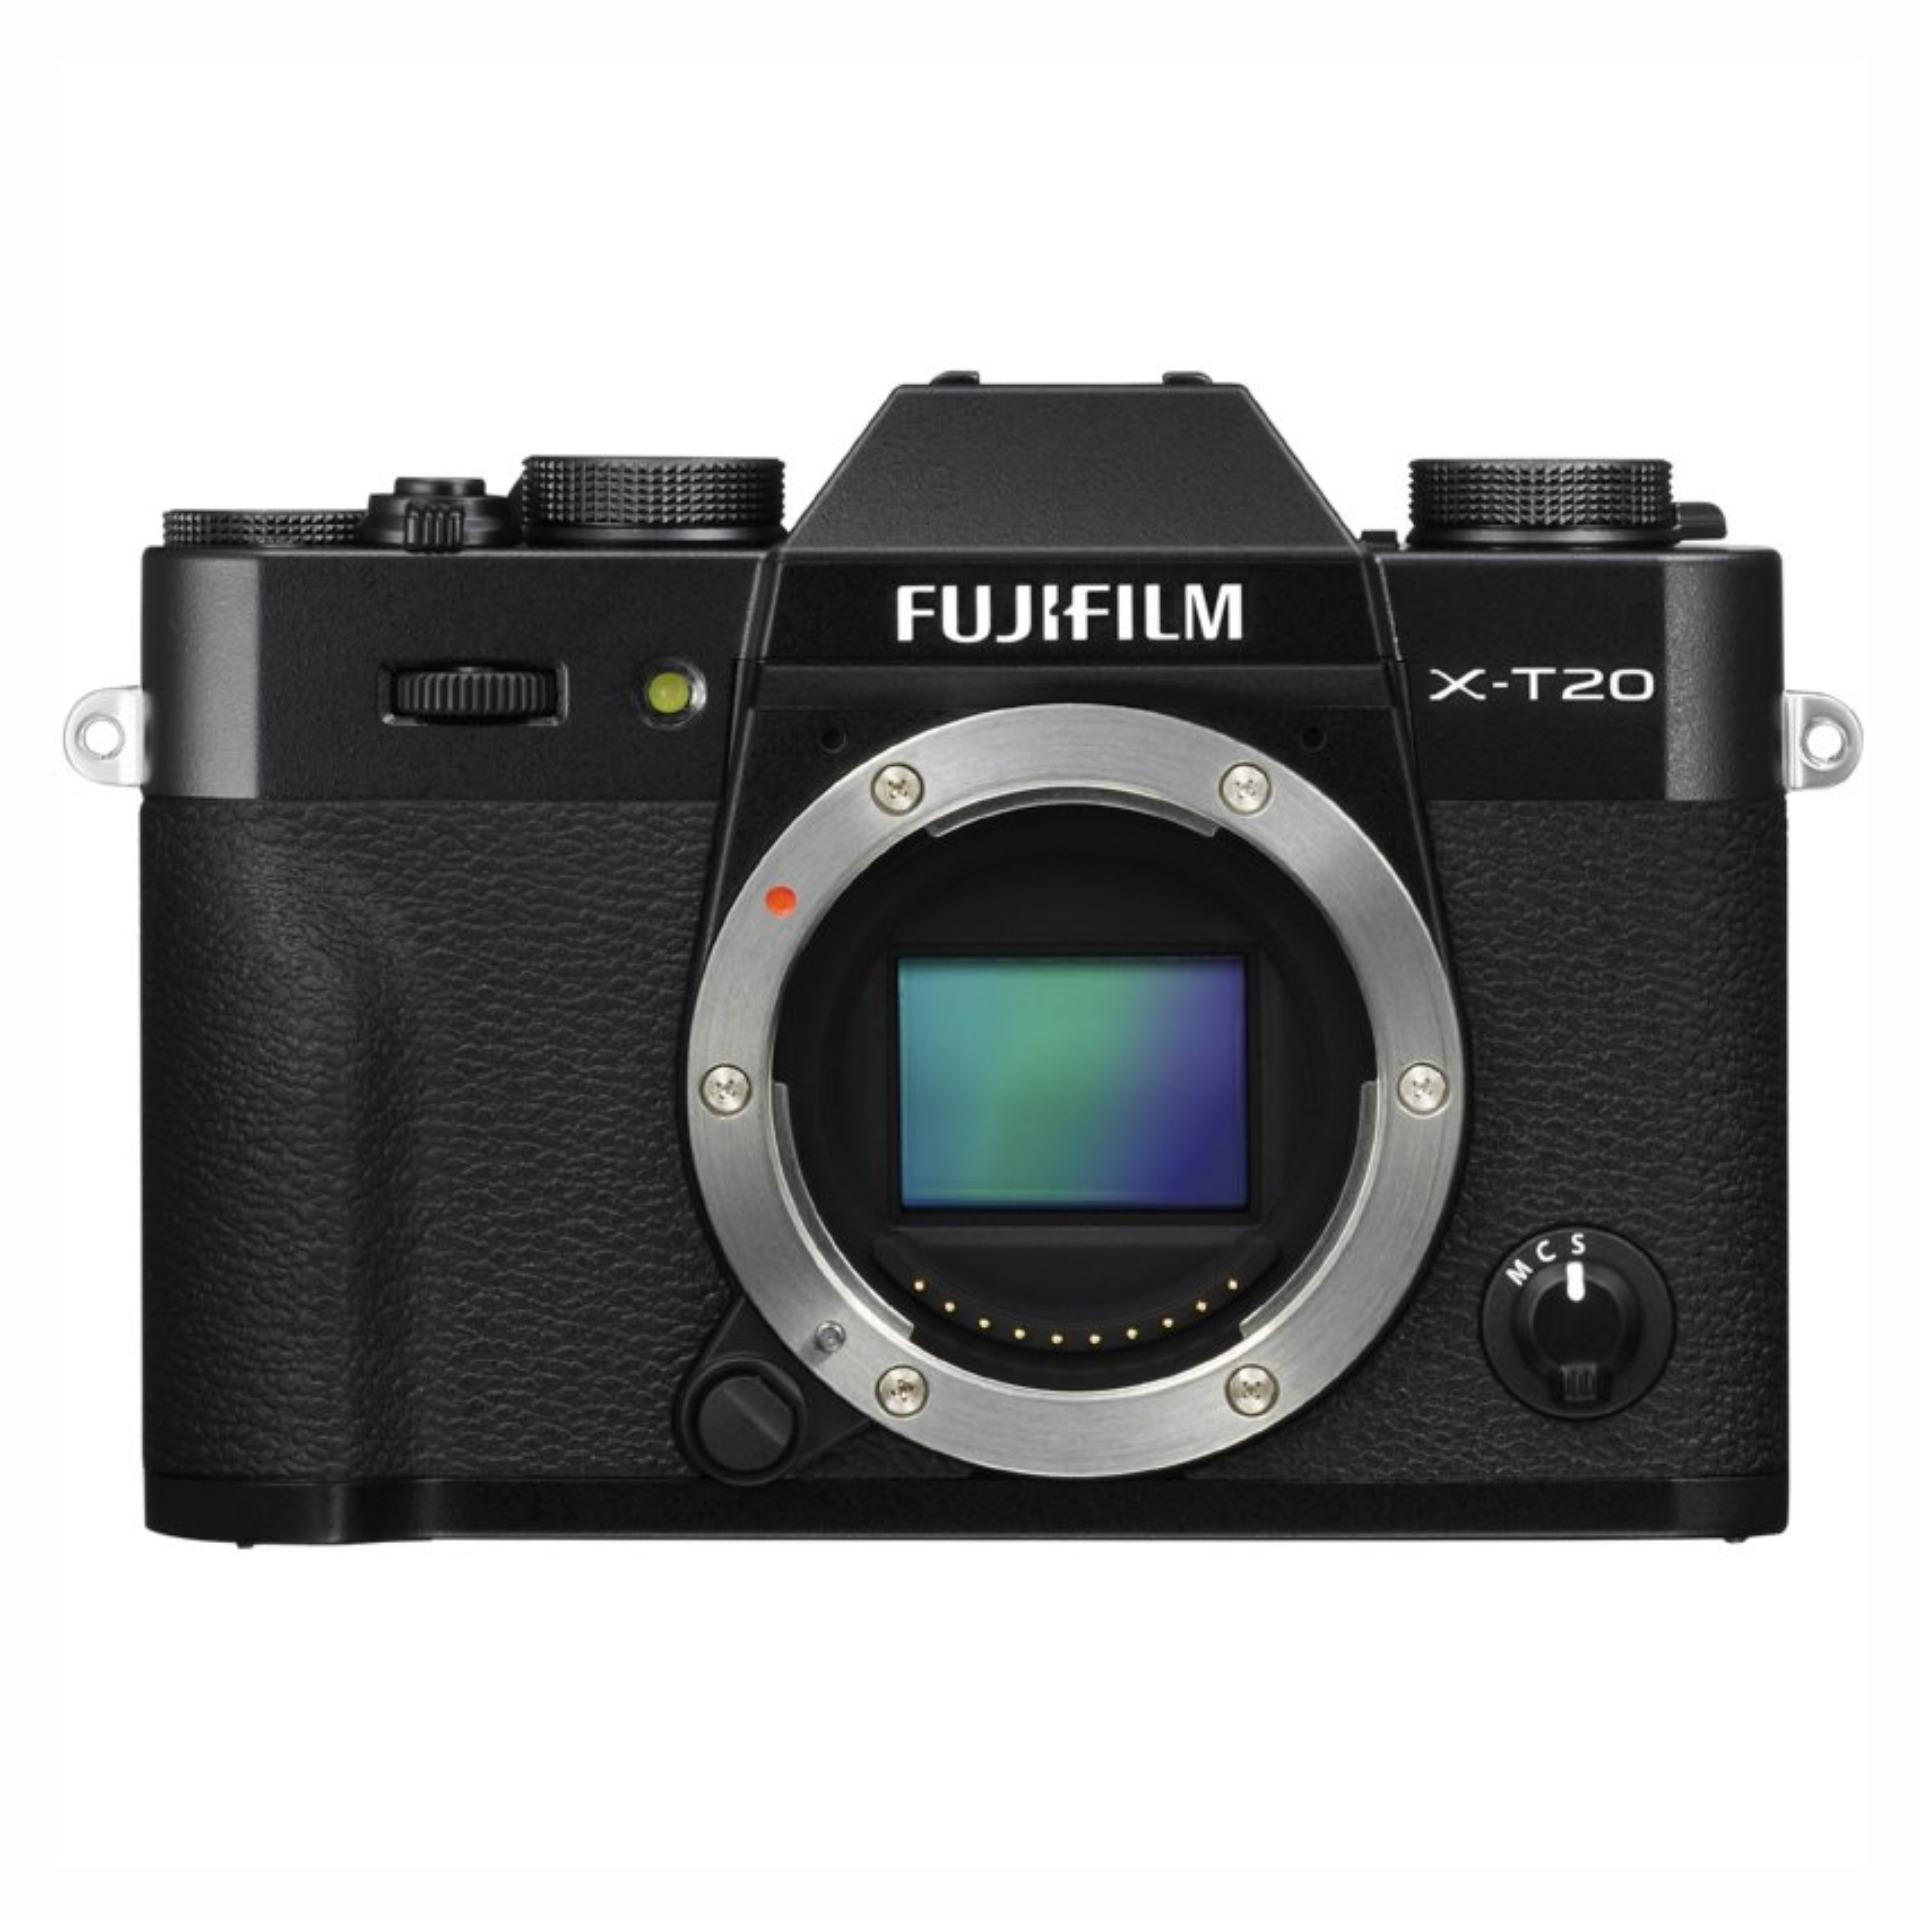 Fujifilm X-T20 Mirrorless Digital Camera Body Only (Black)